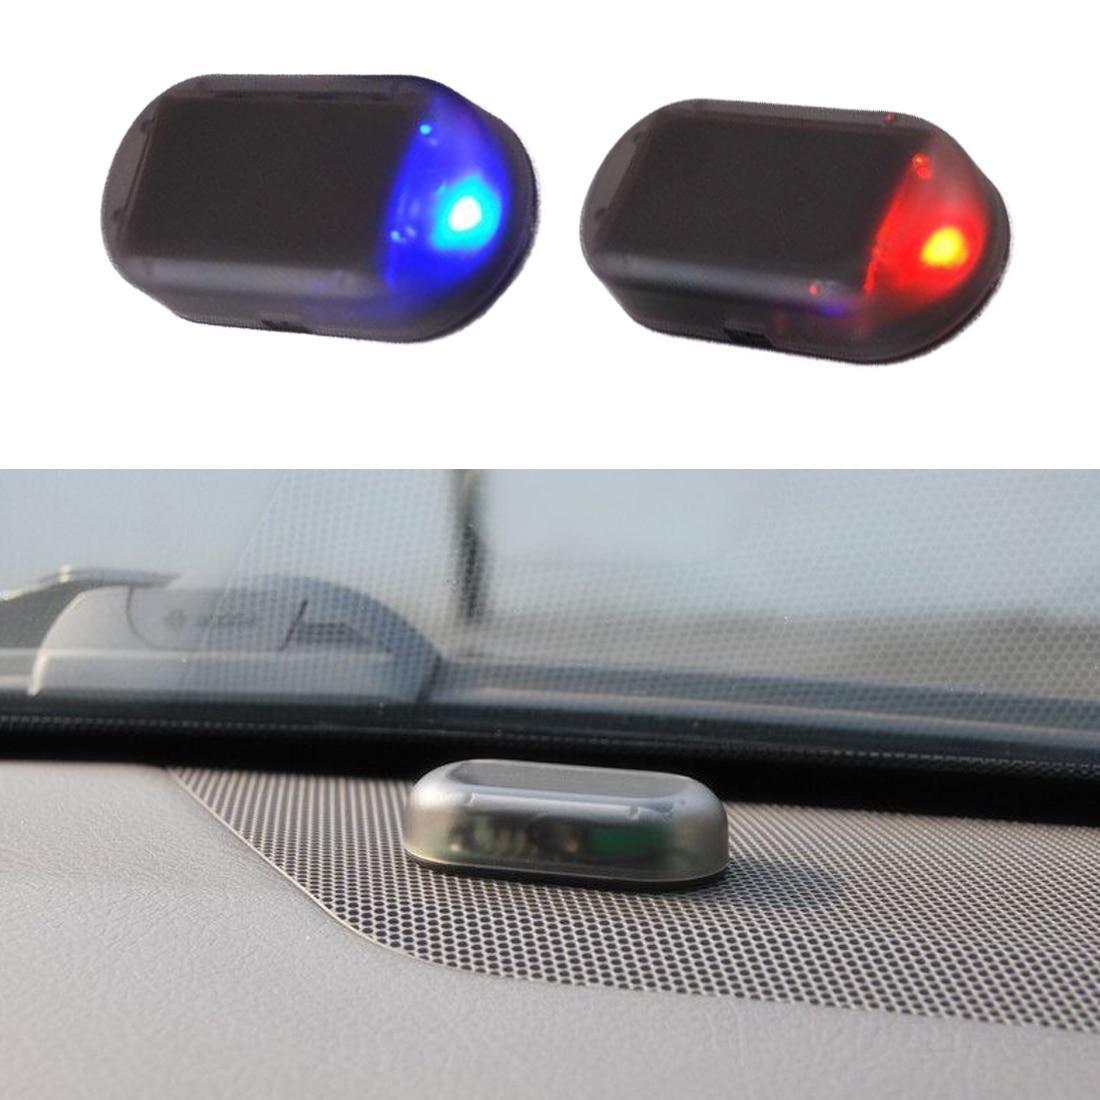 1PCS Universal Car Simulation Alarm Led Light Security Fake Solar System Warning Theft Flash Blinking Car